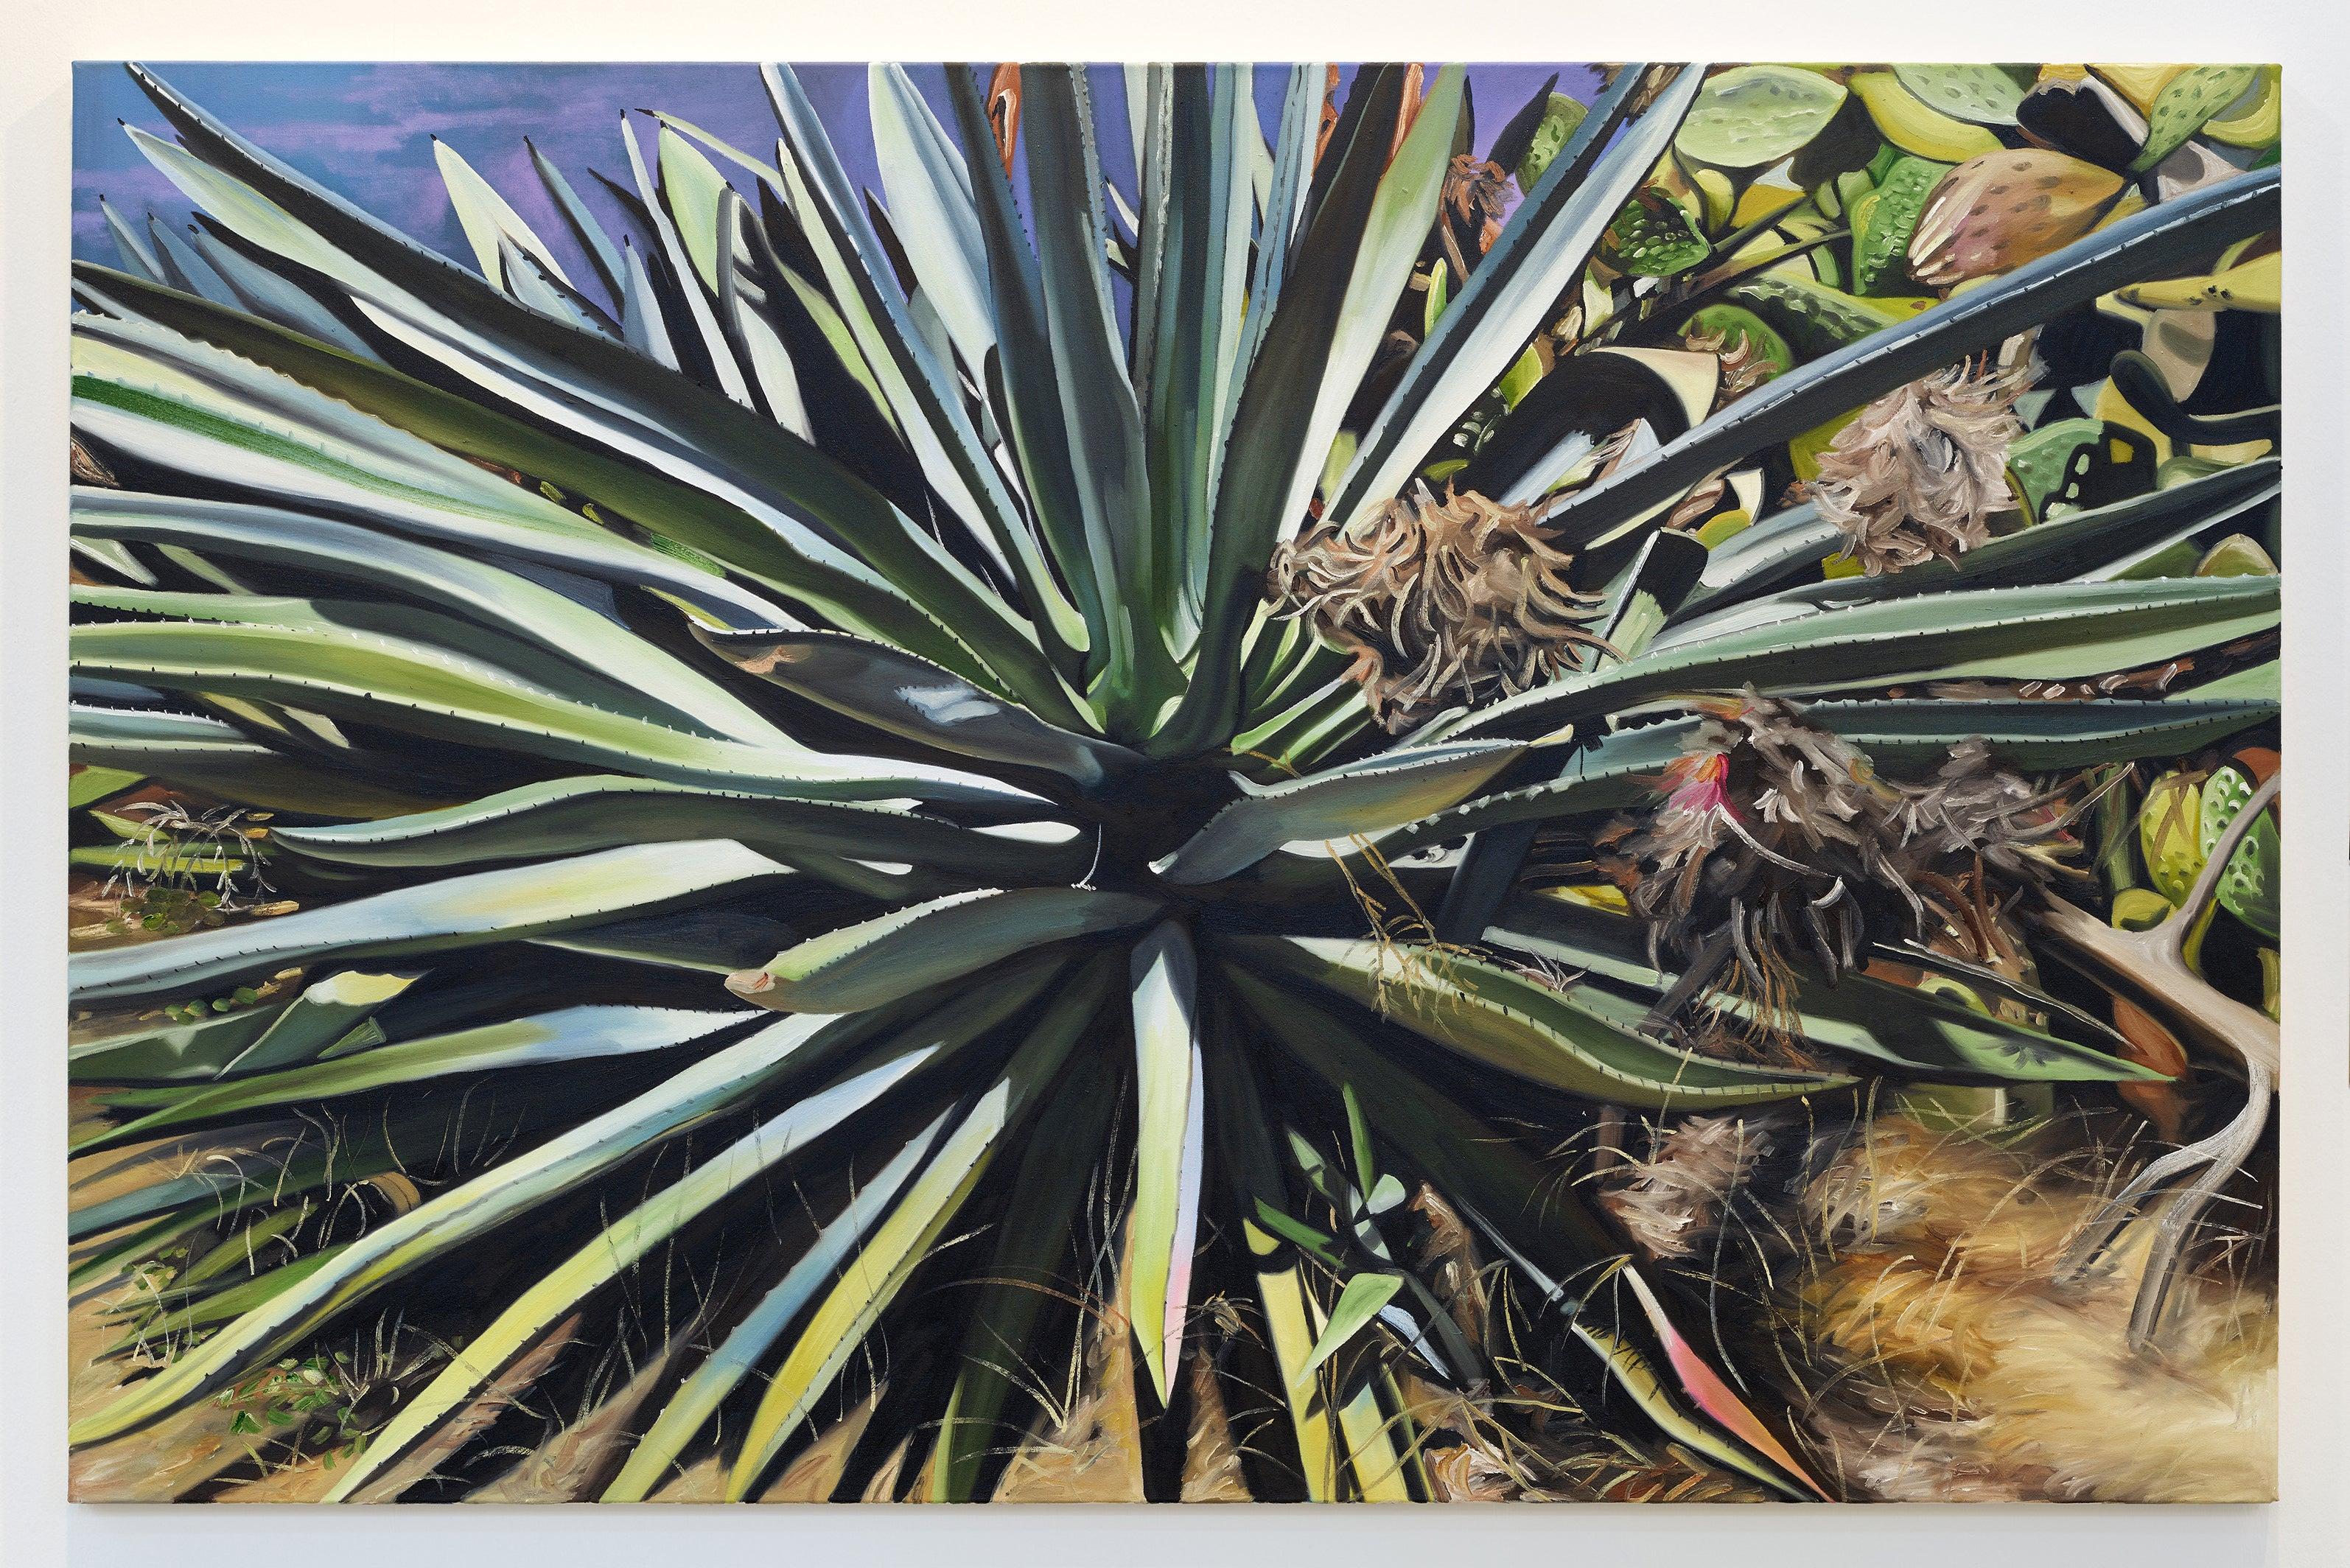 orom id atset (2) / figuration, agave, green, blue, photorealism, landscape